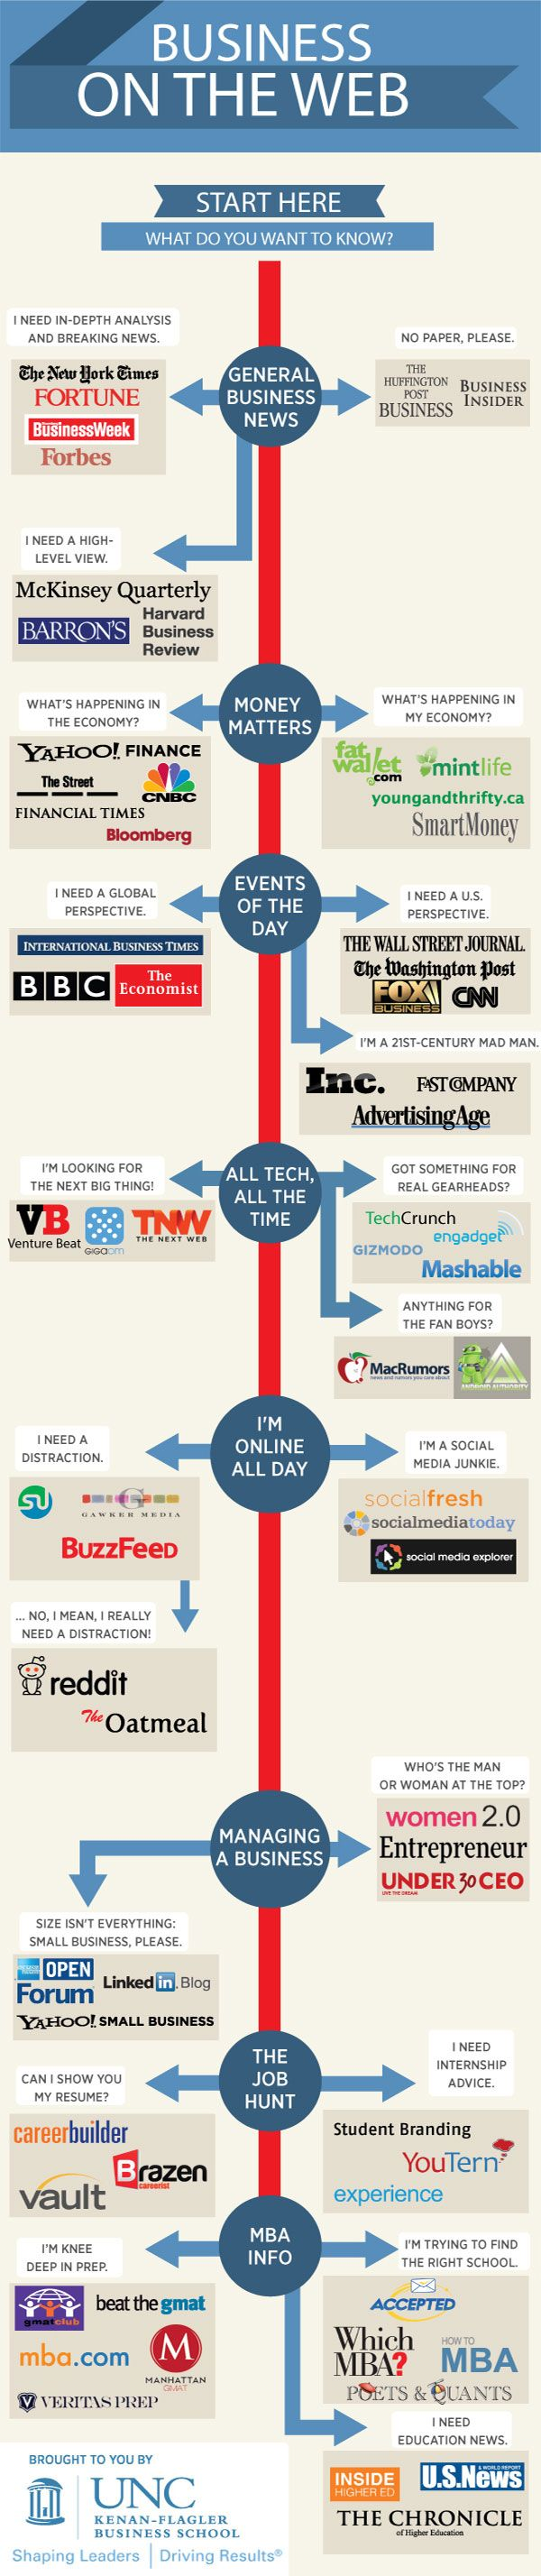 Best Business News Websites1 List of the Best Business News Websites Online